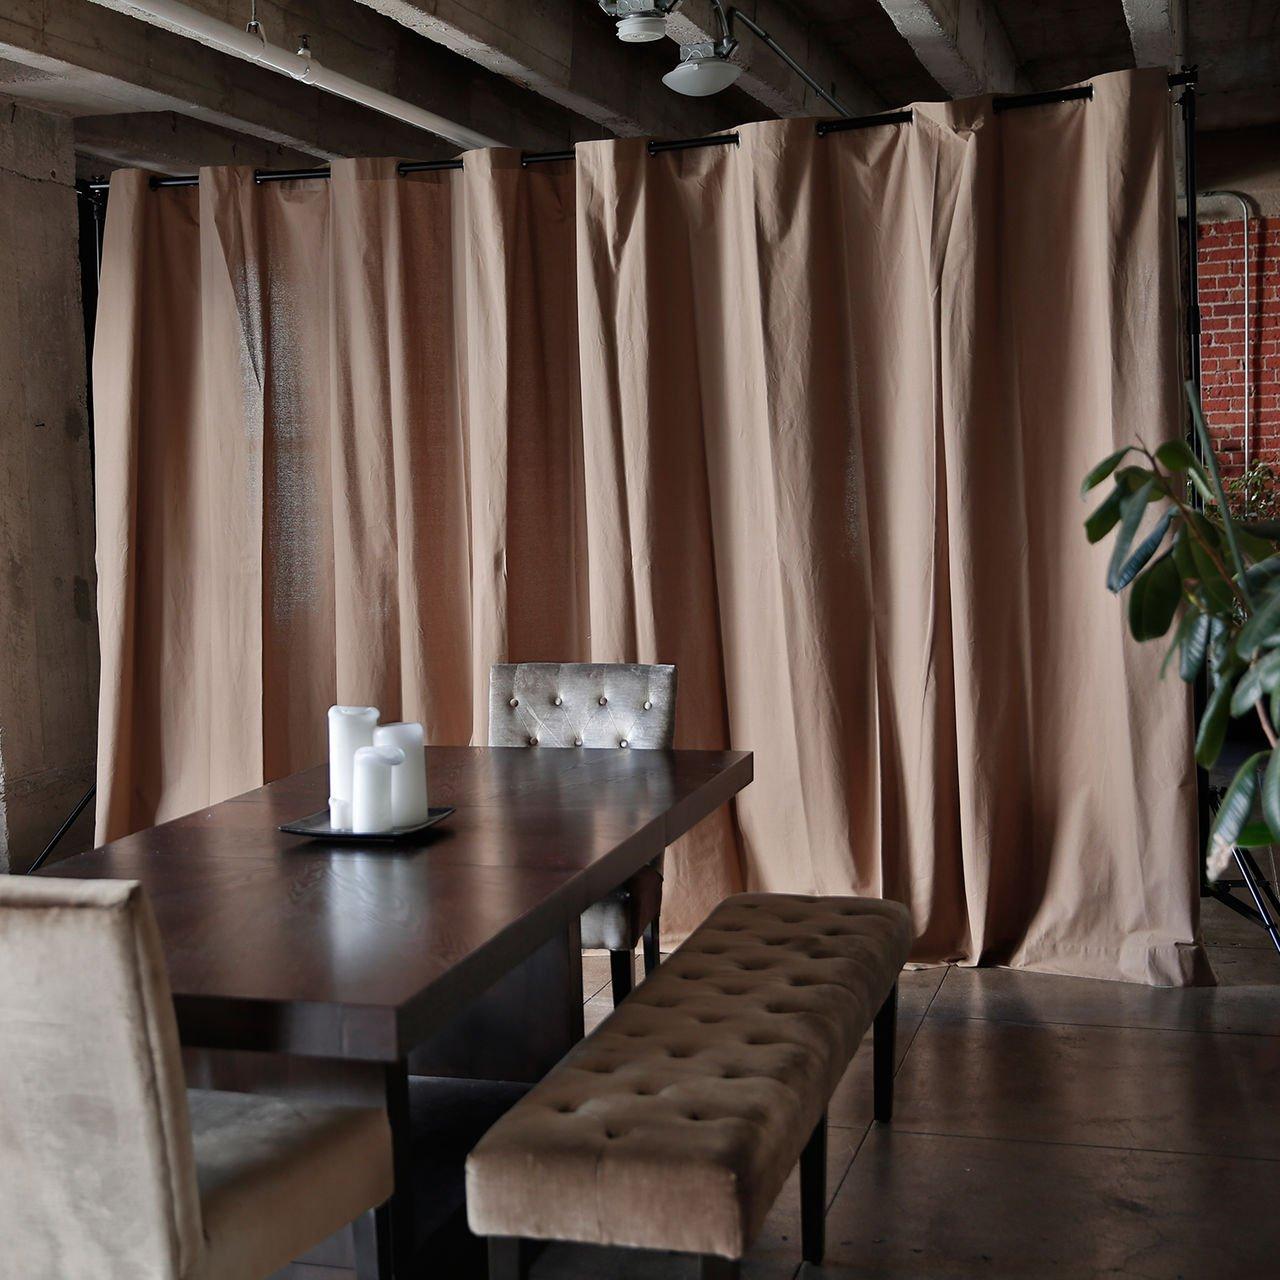 RoomDividersNow Muslin Freestanding Room Divider Kit - Medium B, 9ft Tall x 12ft 6in - 25ft Wide (Khaki)